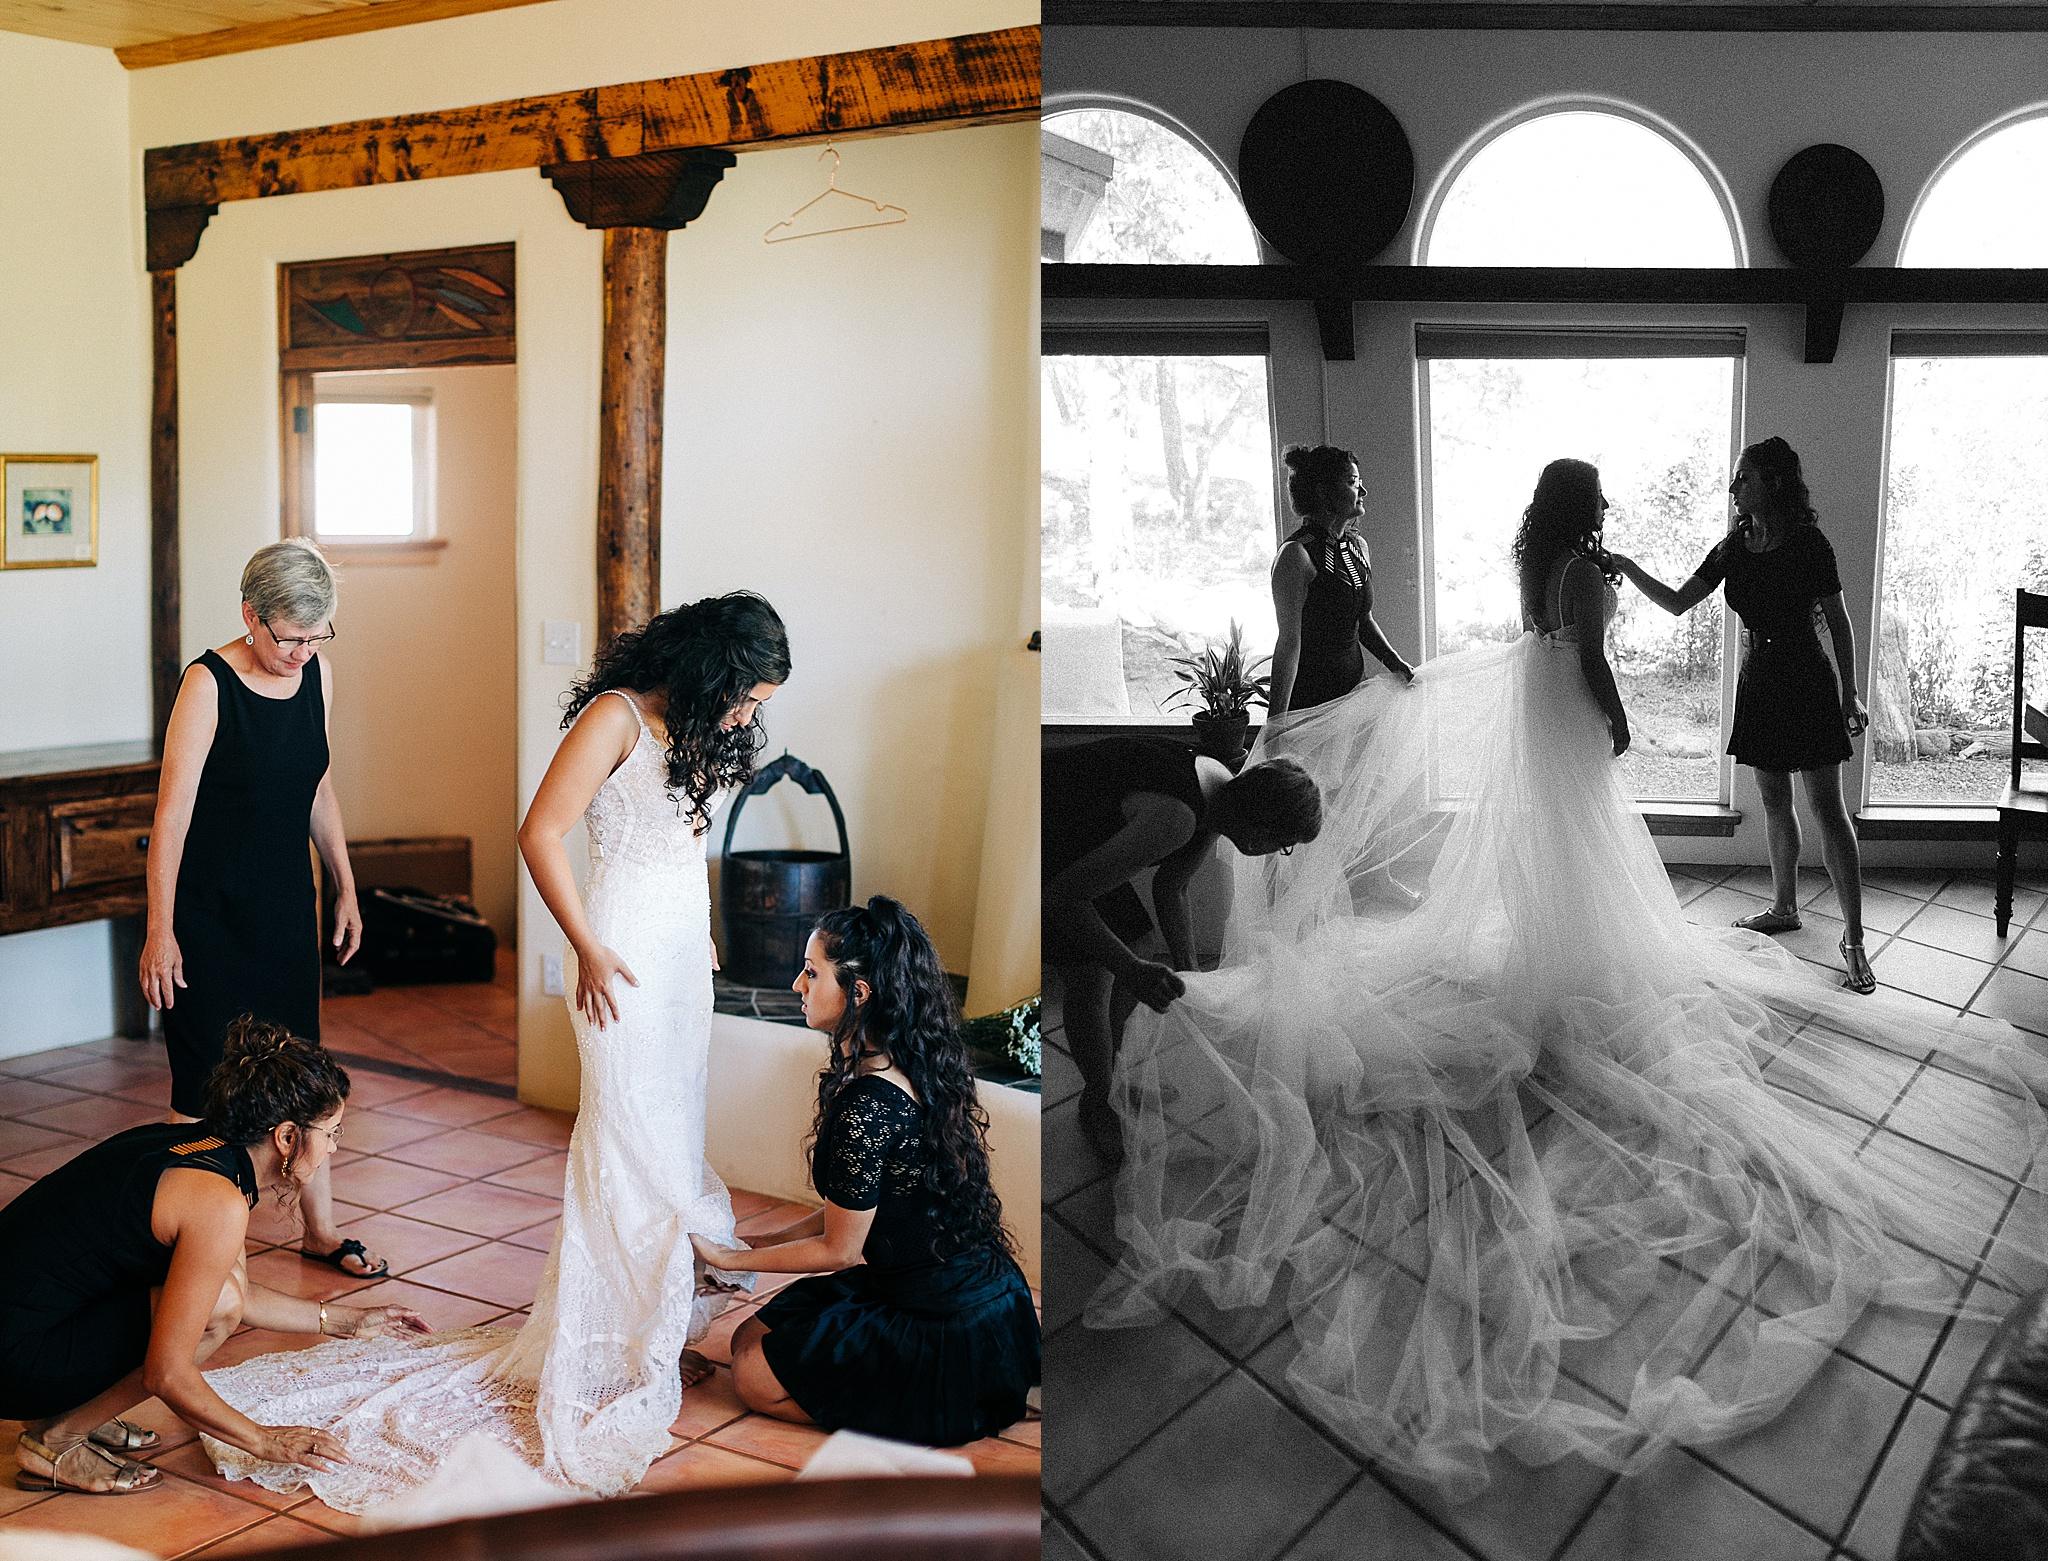 Ed + Sheena's Wedding | 09.14.18Great Sand Dunes, Coloradowww.heatherwallphoto.com